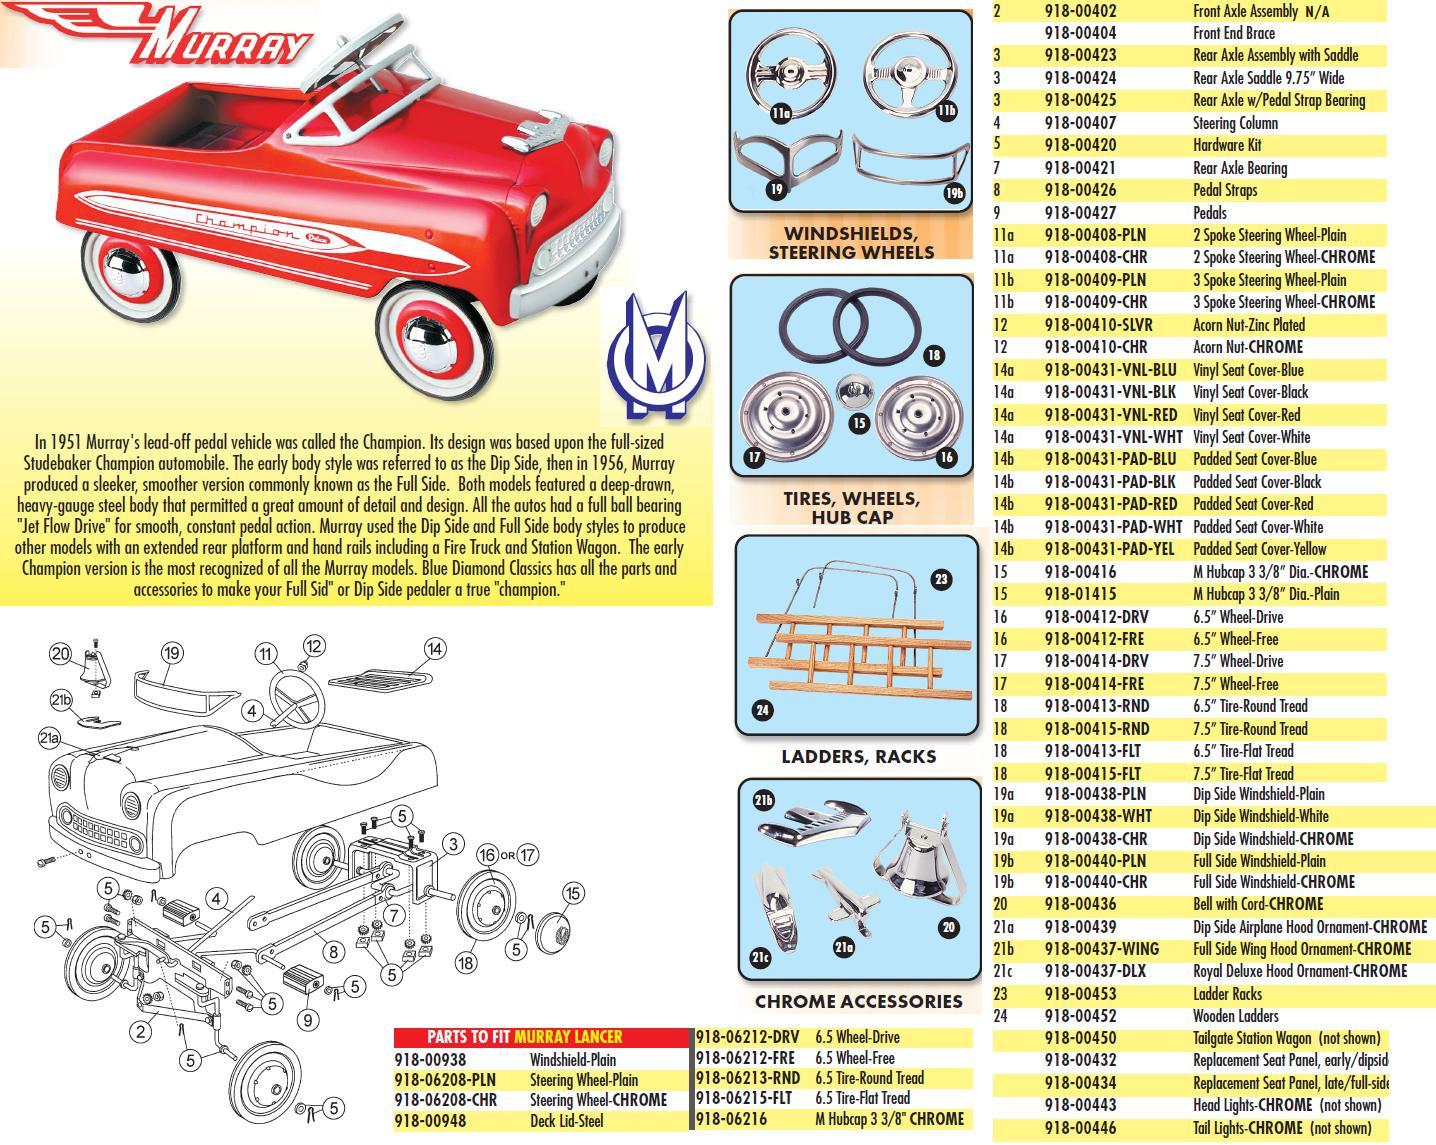 Pedal Car Parts, 7-1/2 Inch Tire